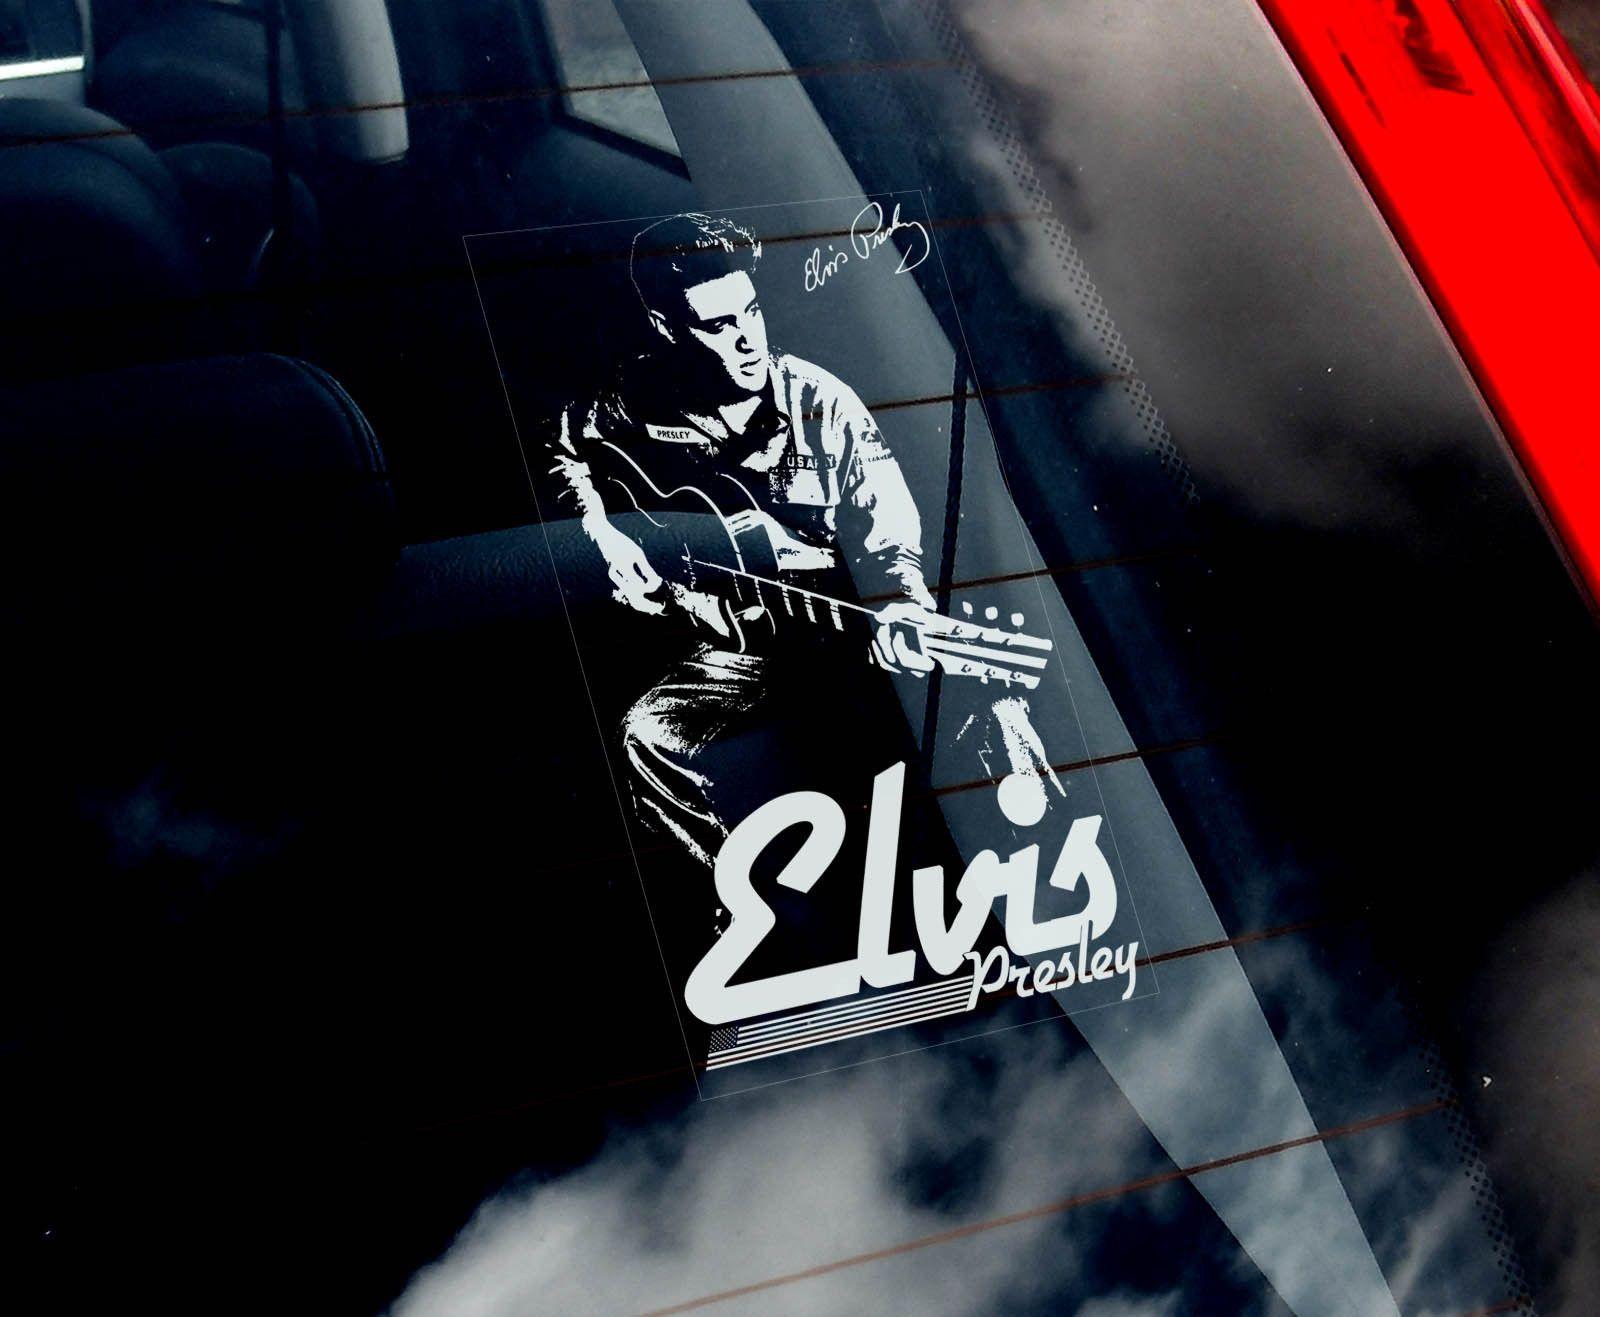 Elvis Presley Car Window Sticker The King Rock N Roll Music Sign Decal V04 Ebay